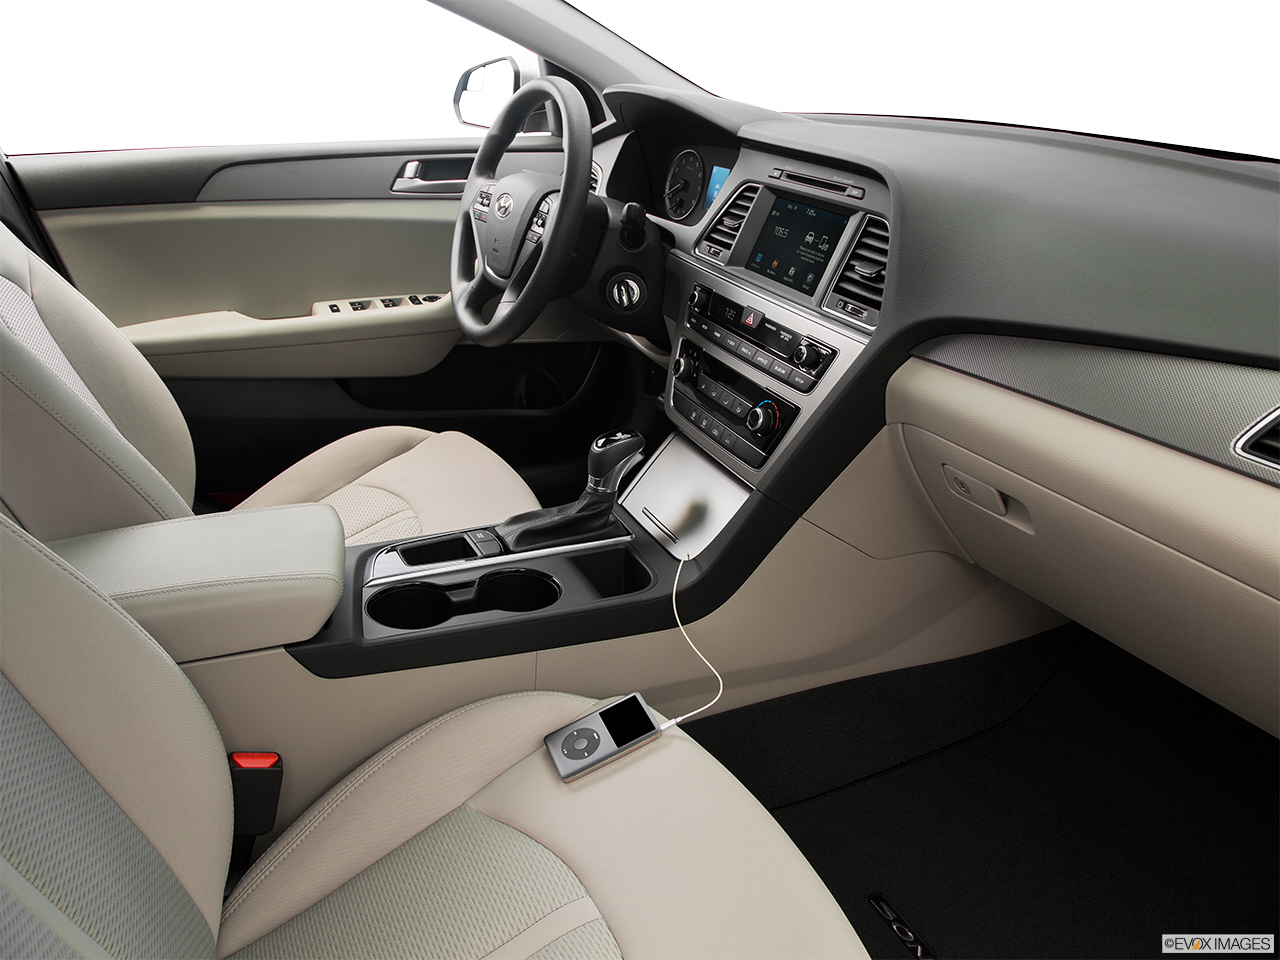 Kia Cars Price List Saudi Arabia